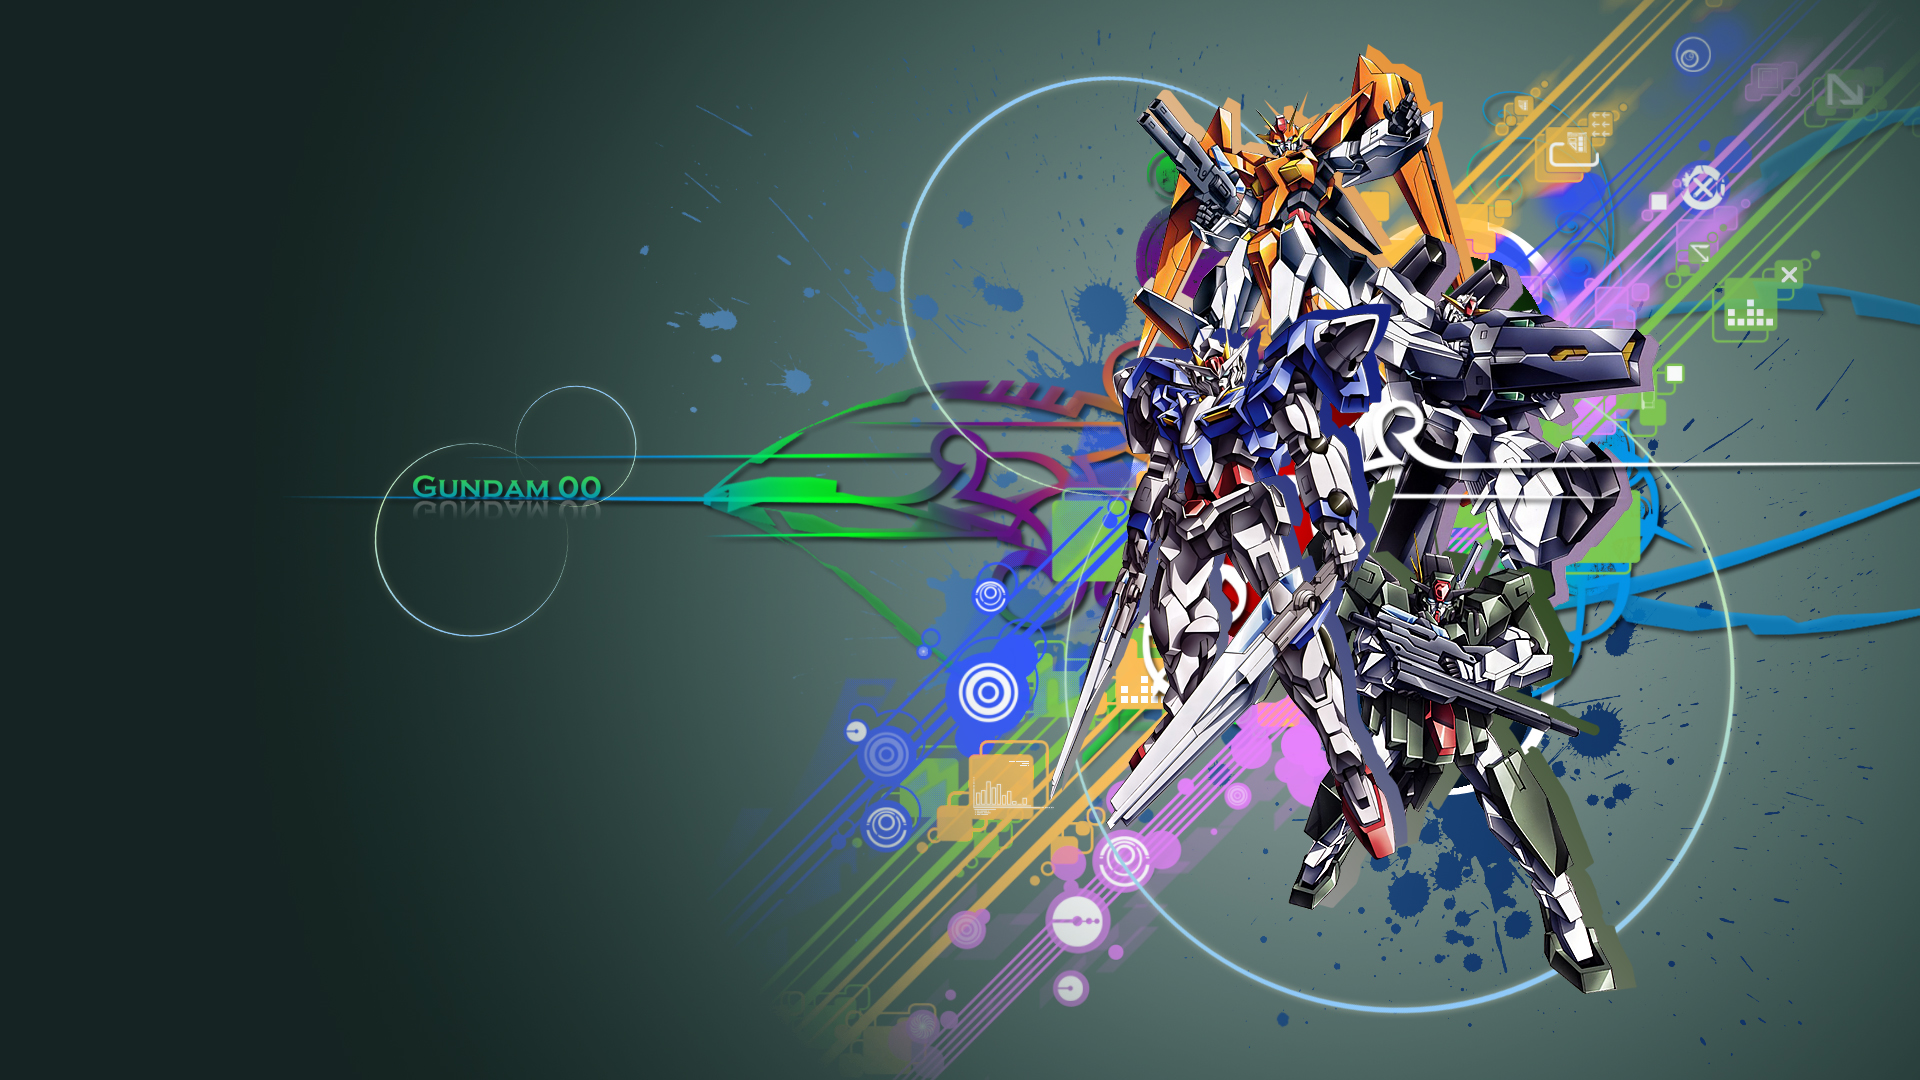 Gundam full hd wallpaper and background image 1920x1080 id226518 anime gundam wallpaper voltagebd Images